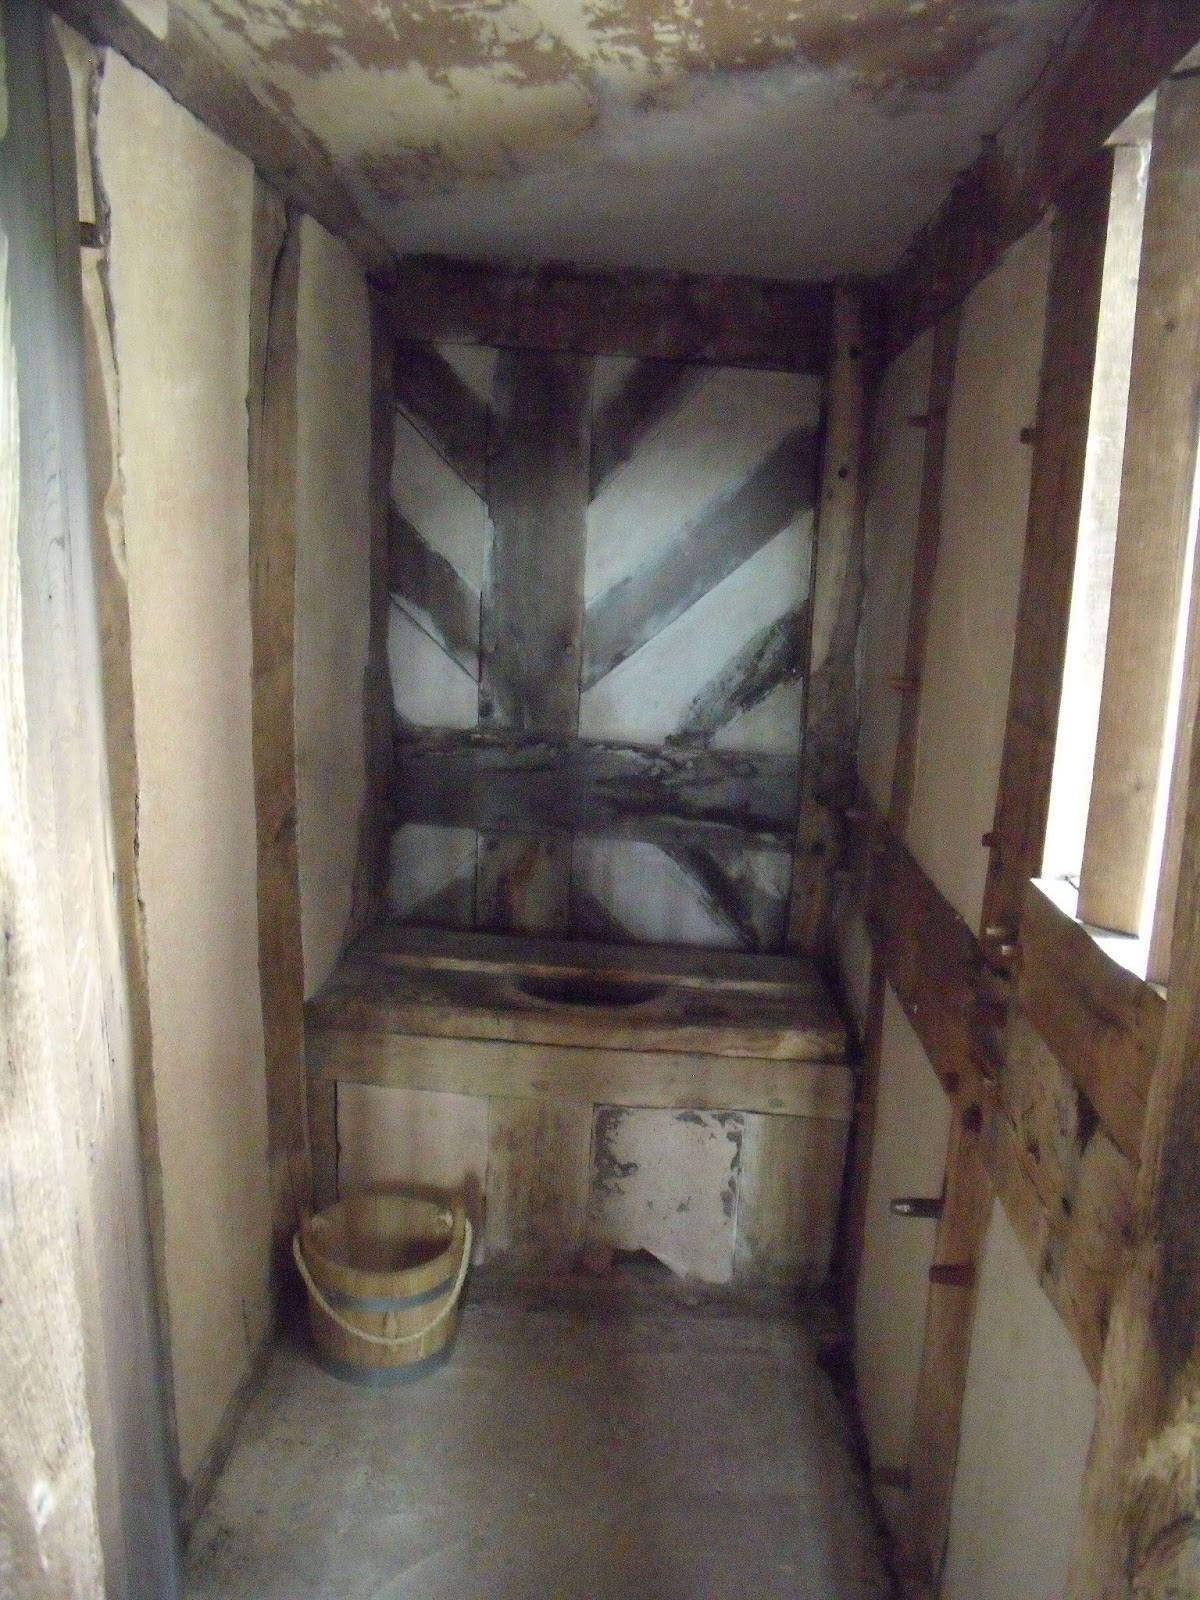 After60 Thenext10 National Trust 9 Little Moreton Hall